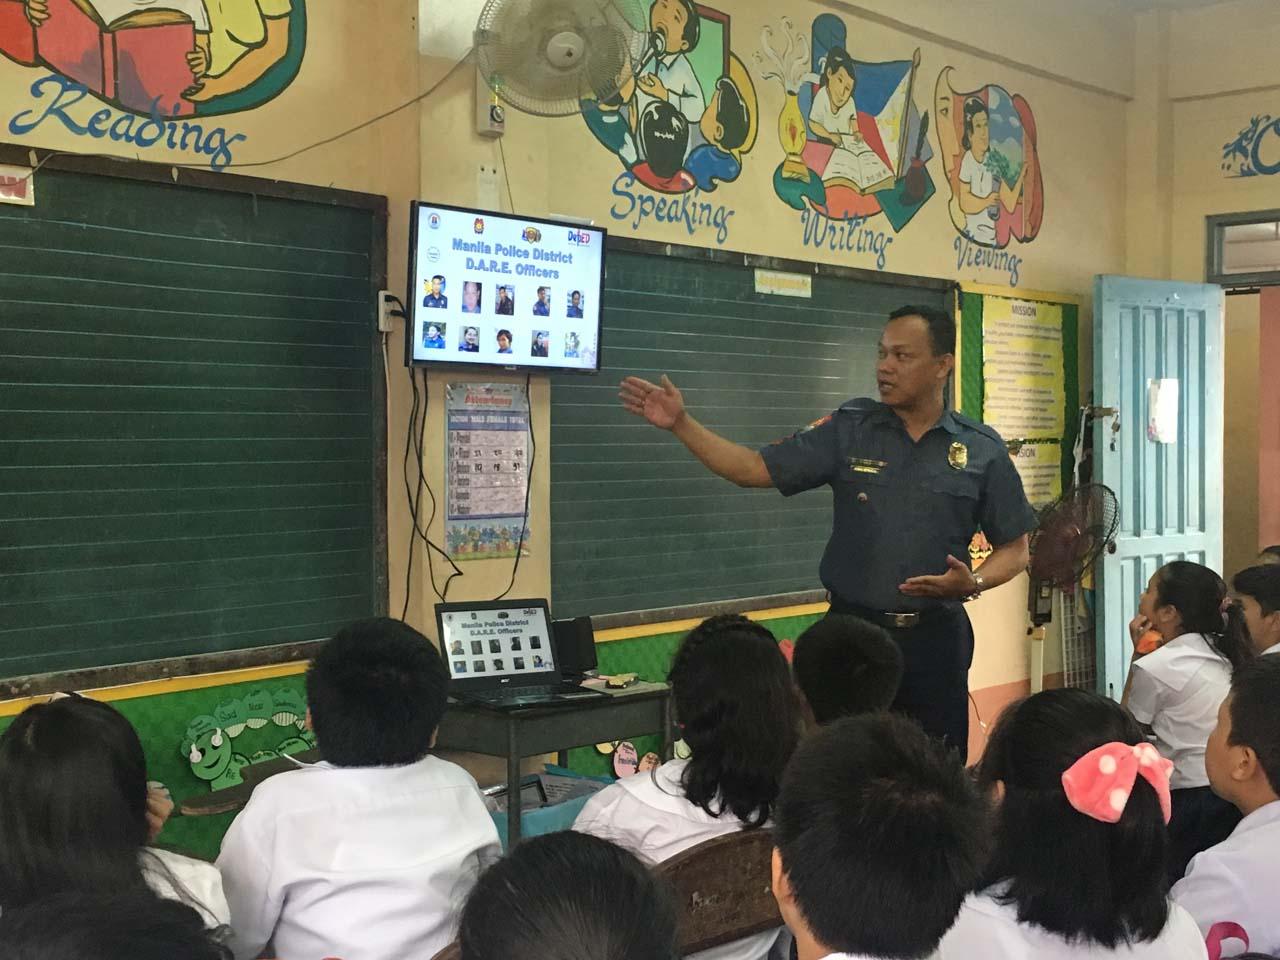 From guns to blackboards: Police officers teach kids vs drug abuse